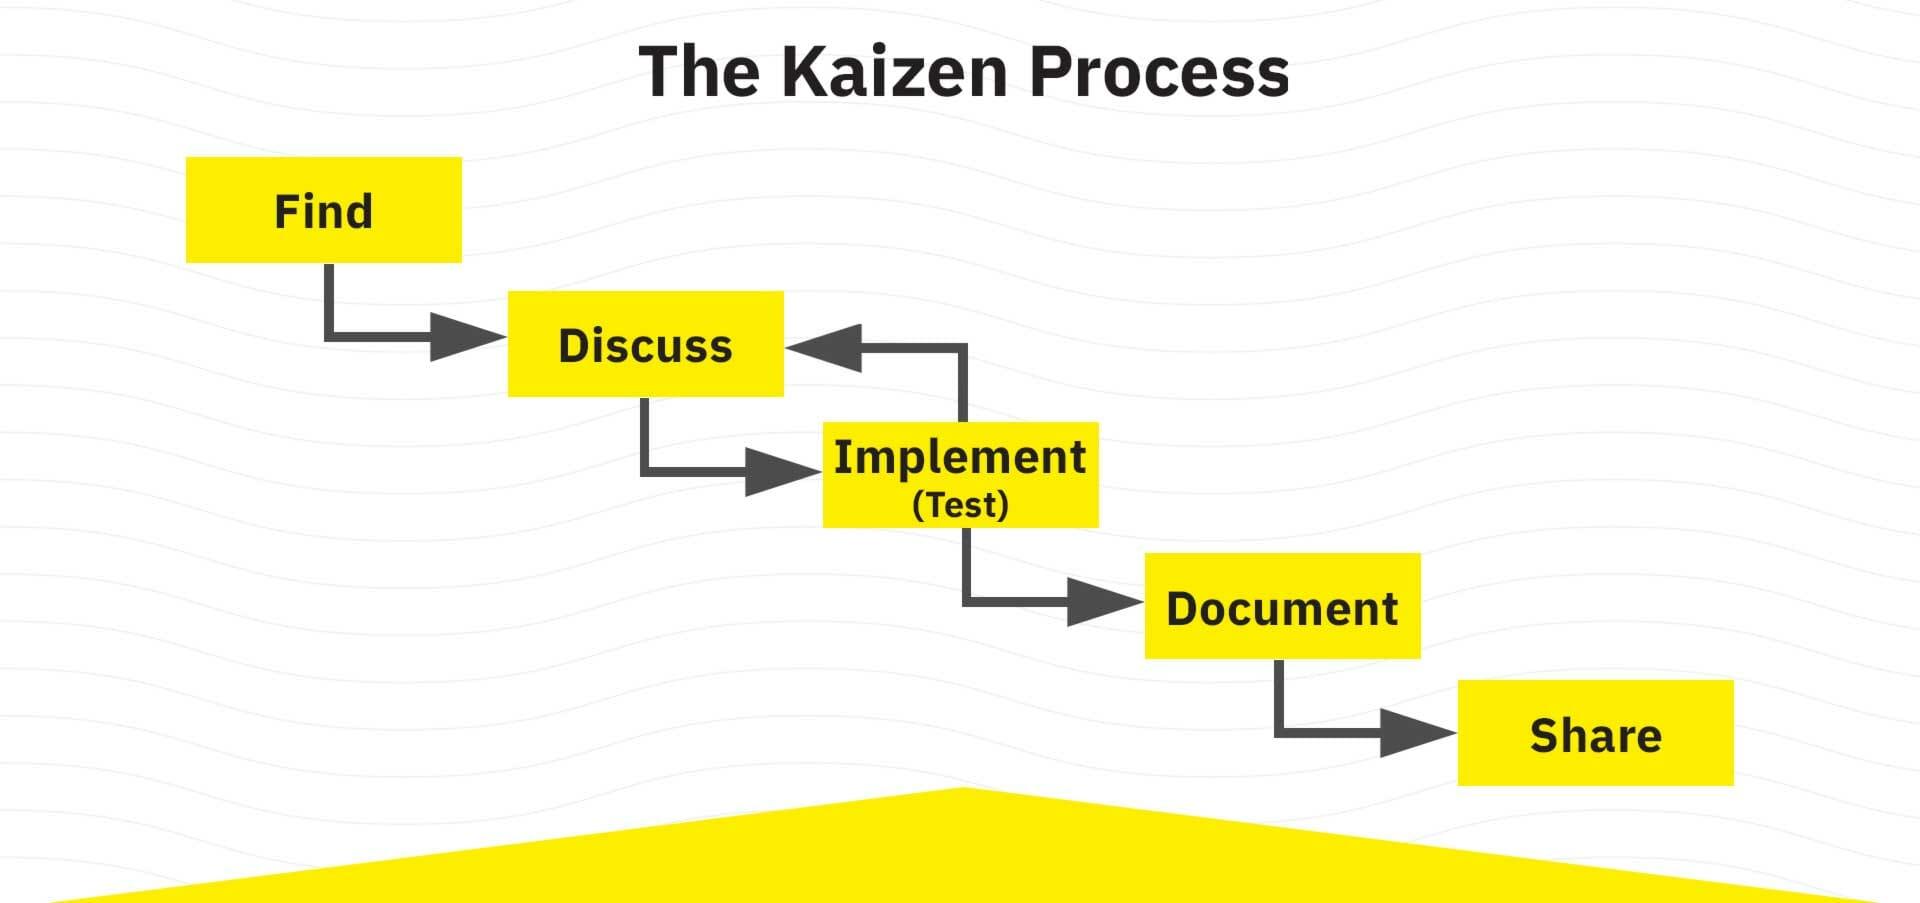 The Kaizen Process